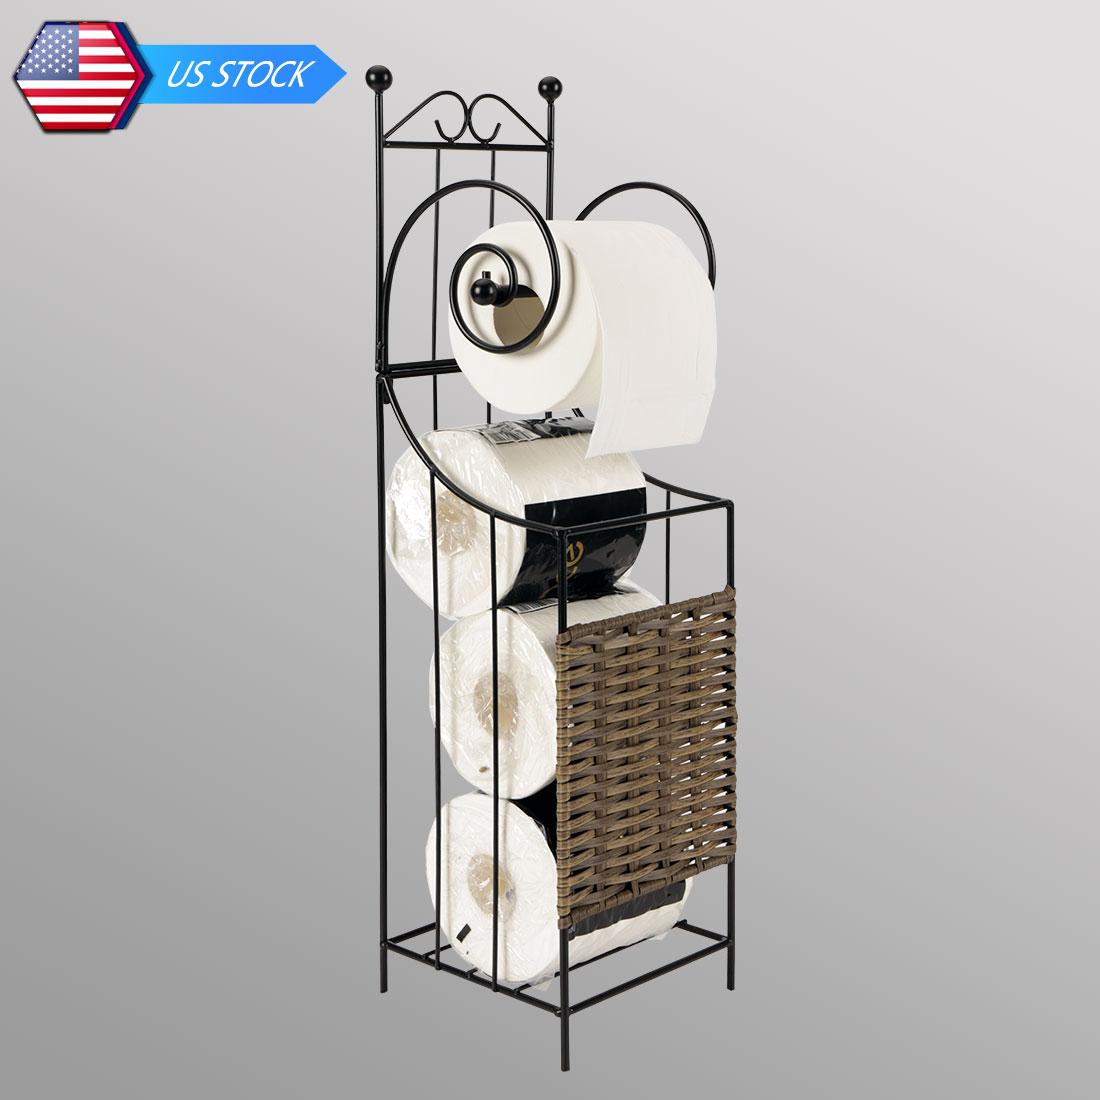 Metal Frame Toilet Tissue Paper Roll Holder Stand Shelf